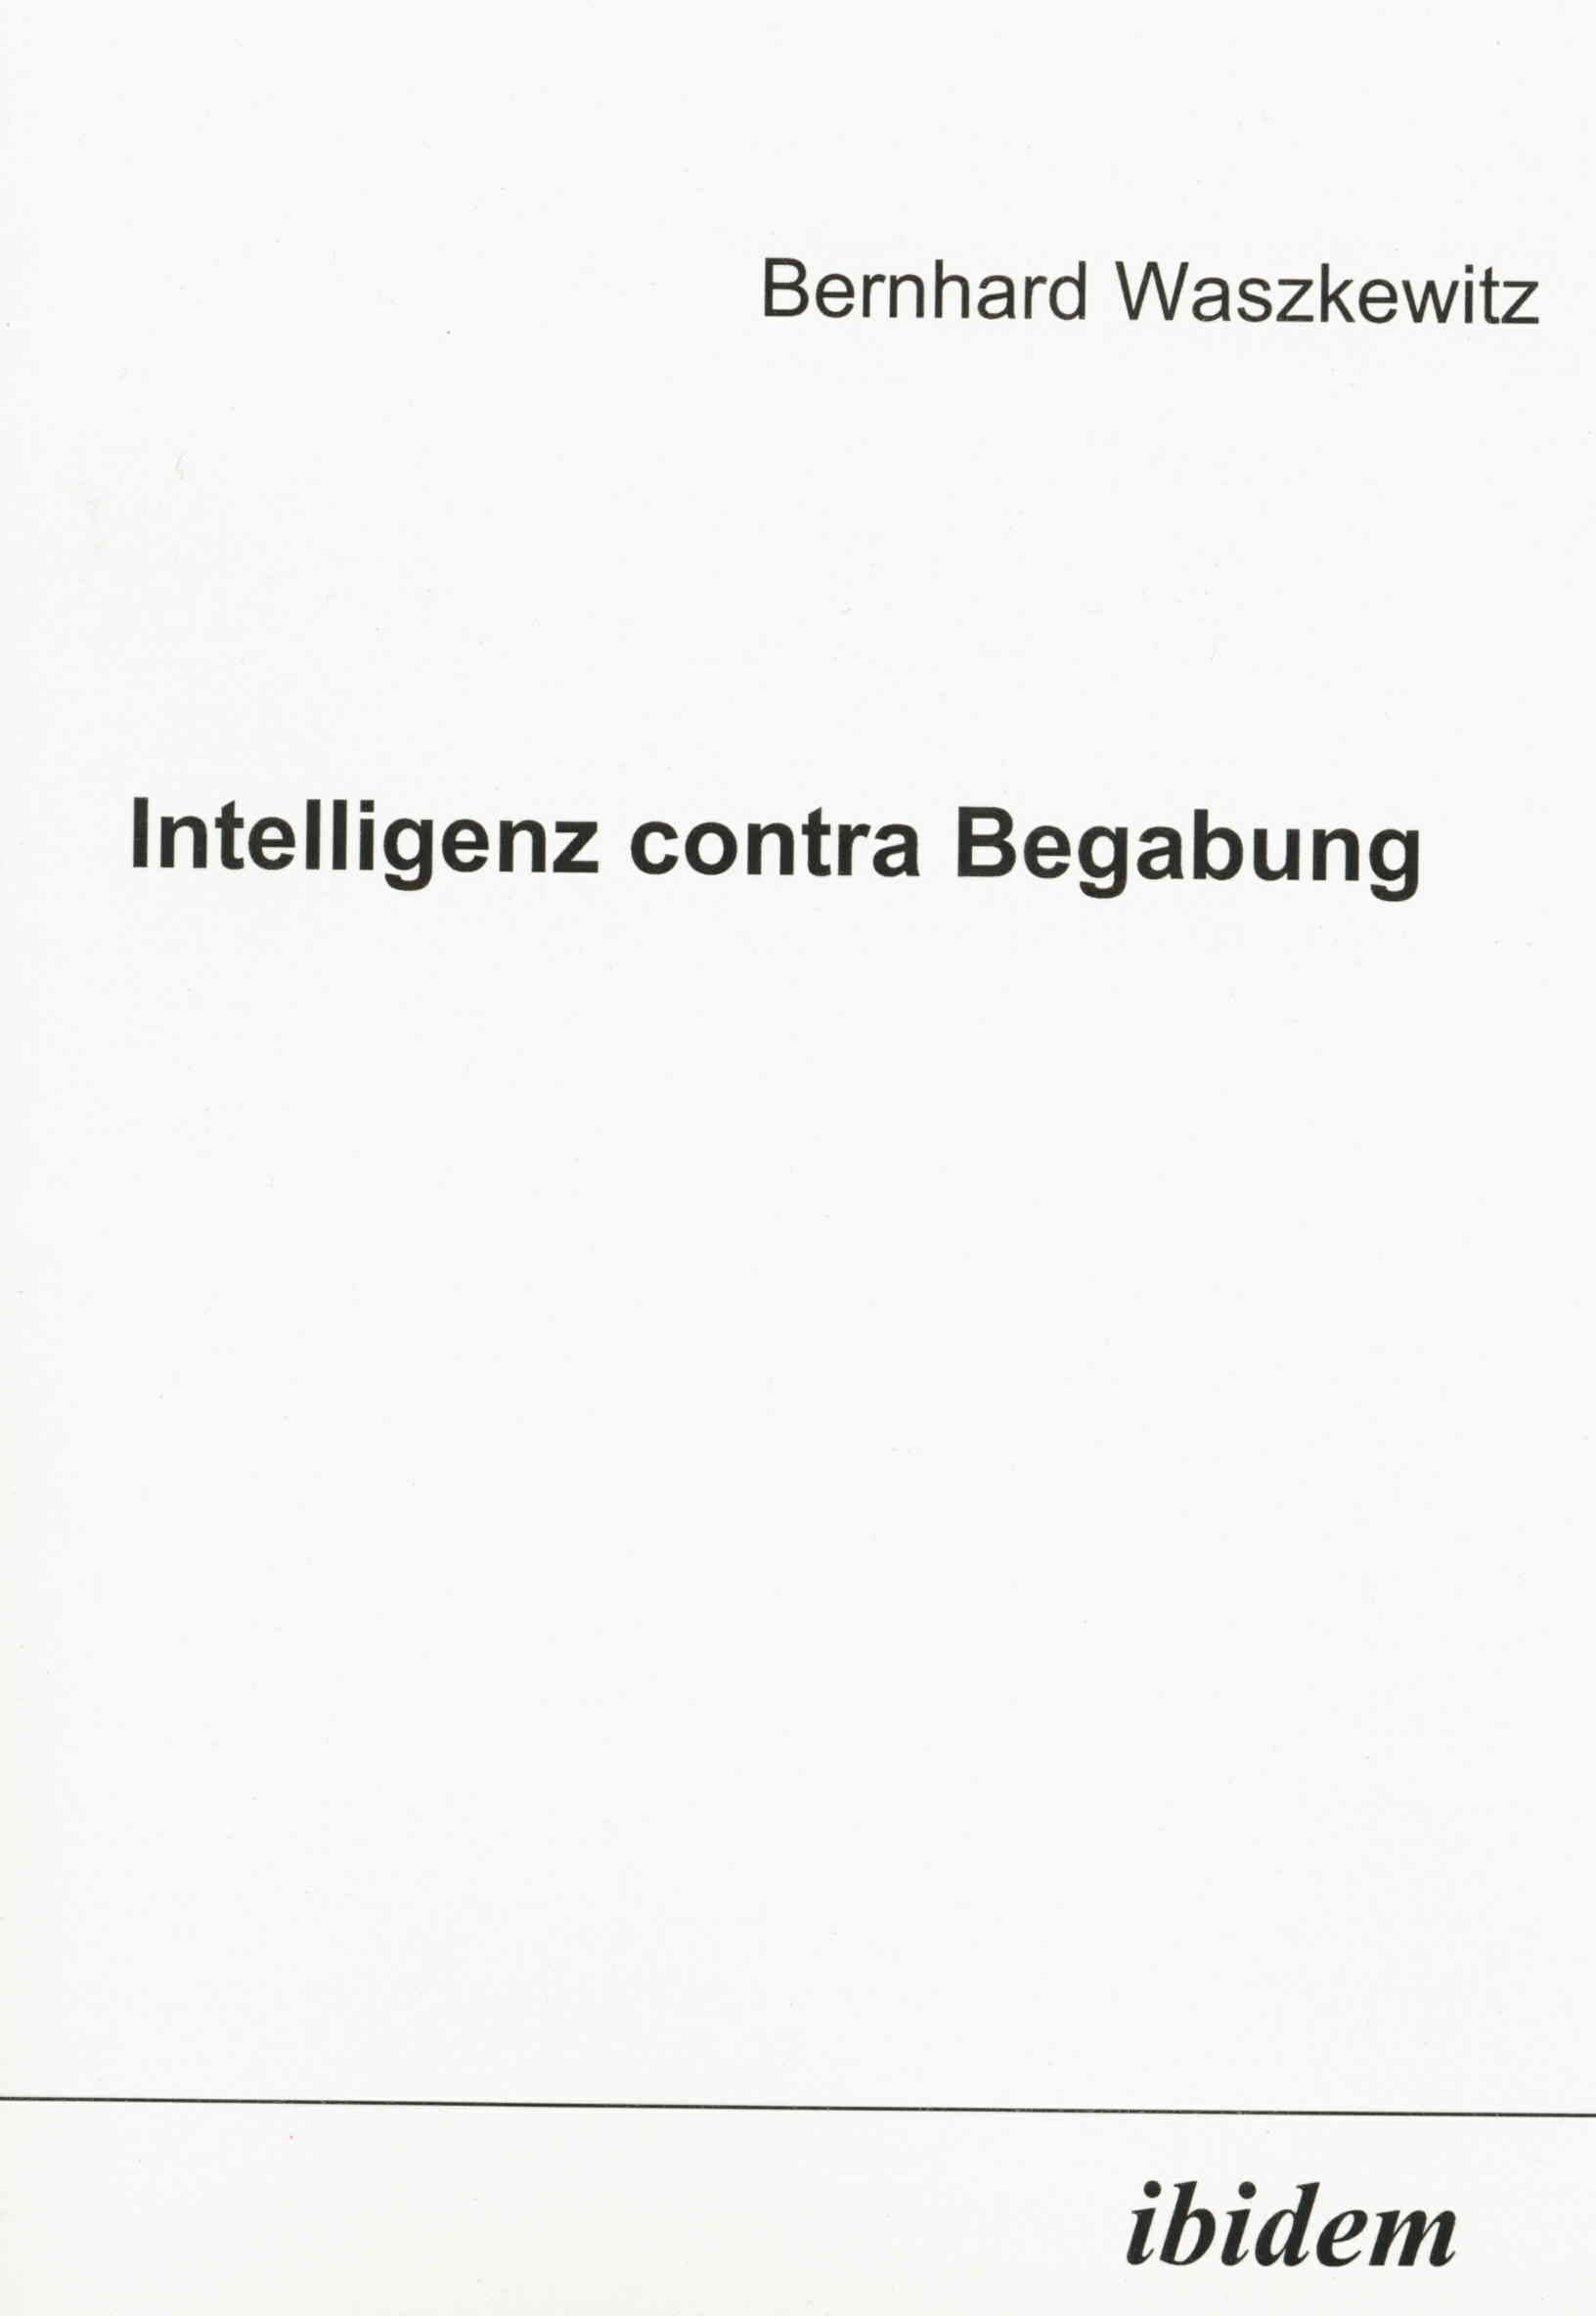 Intelligenz contra Begabung